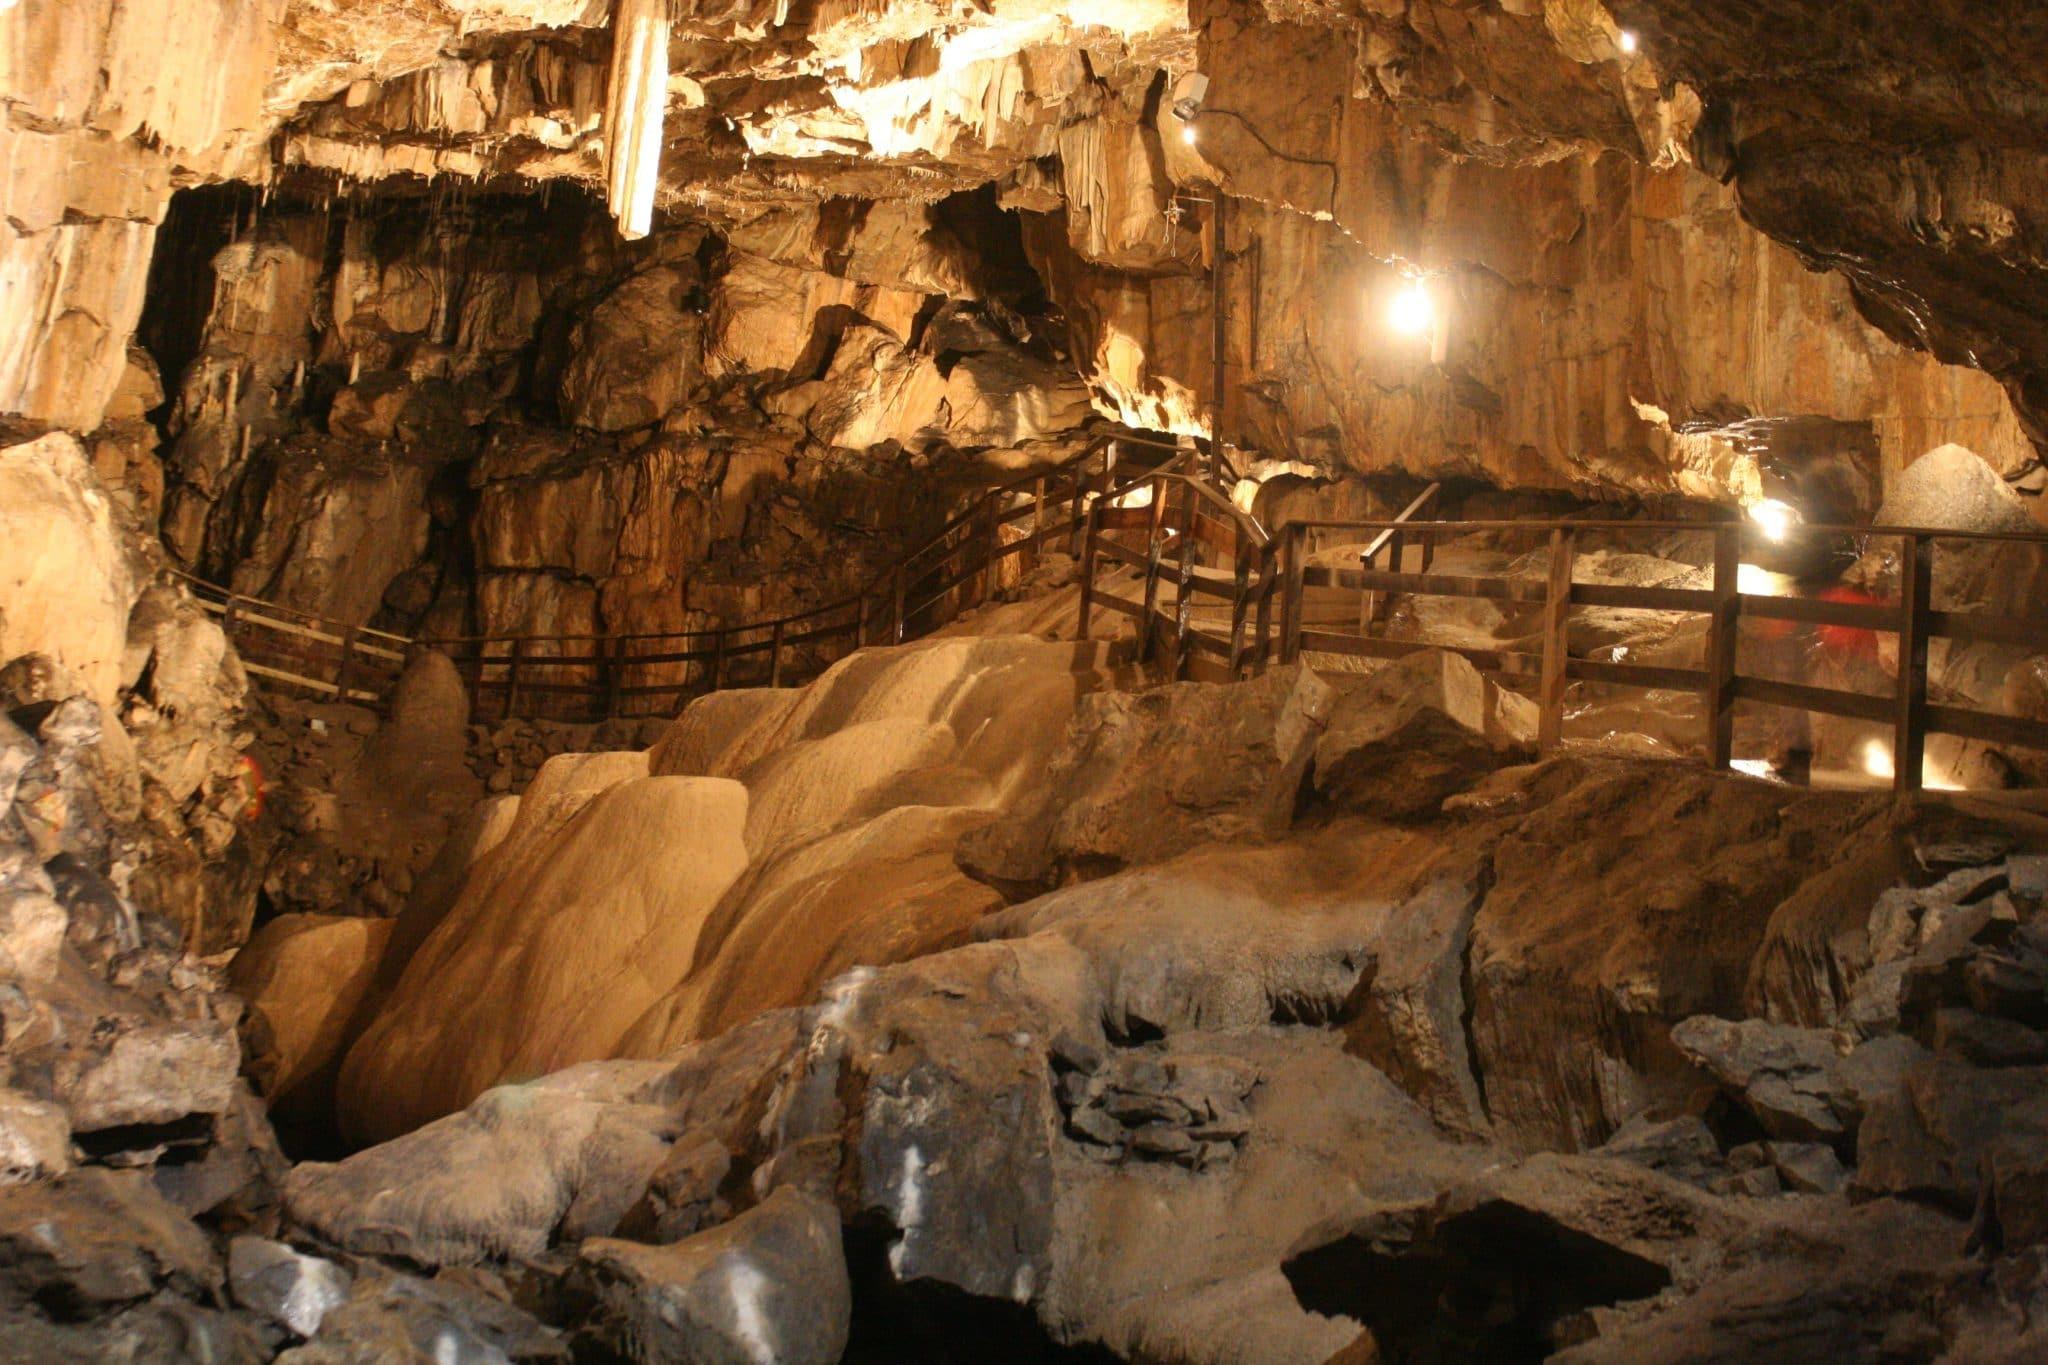 Poole Cavern